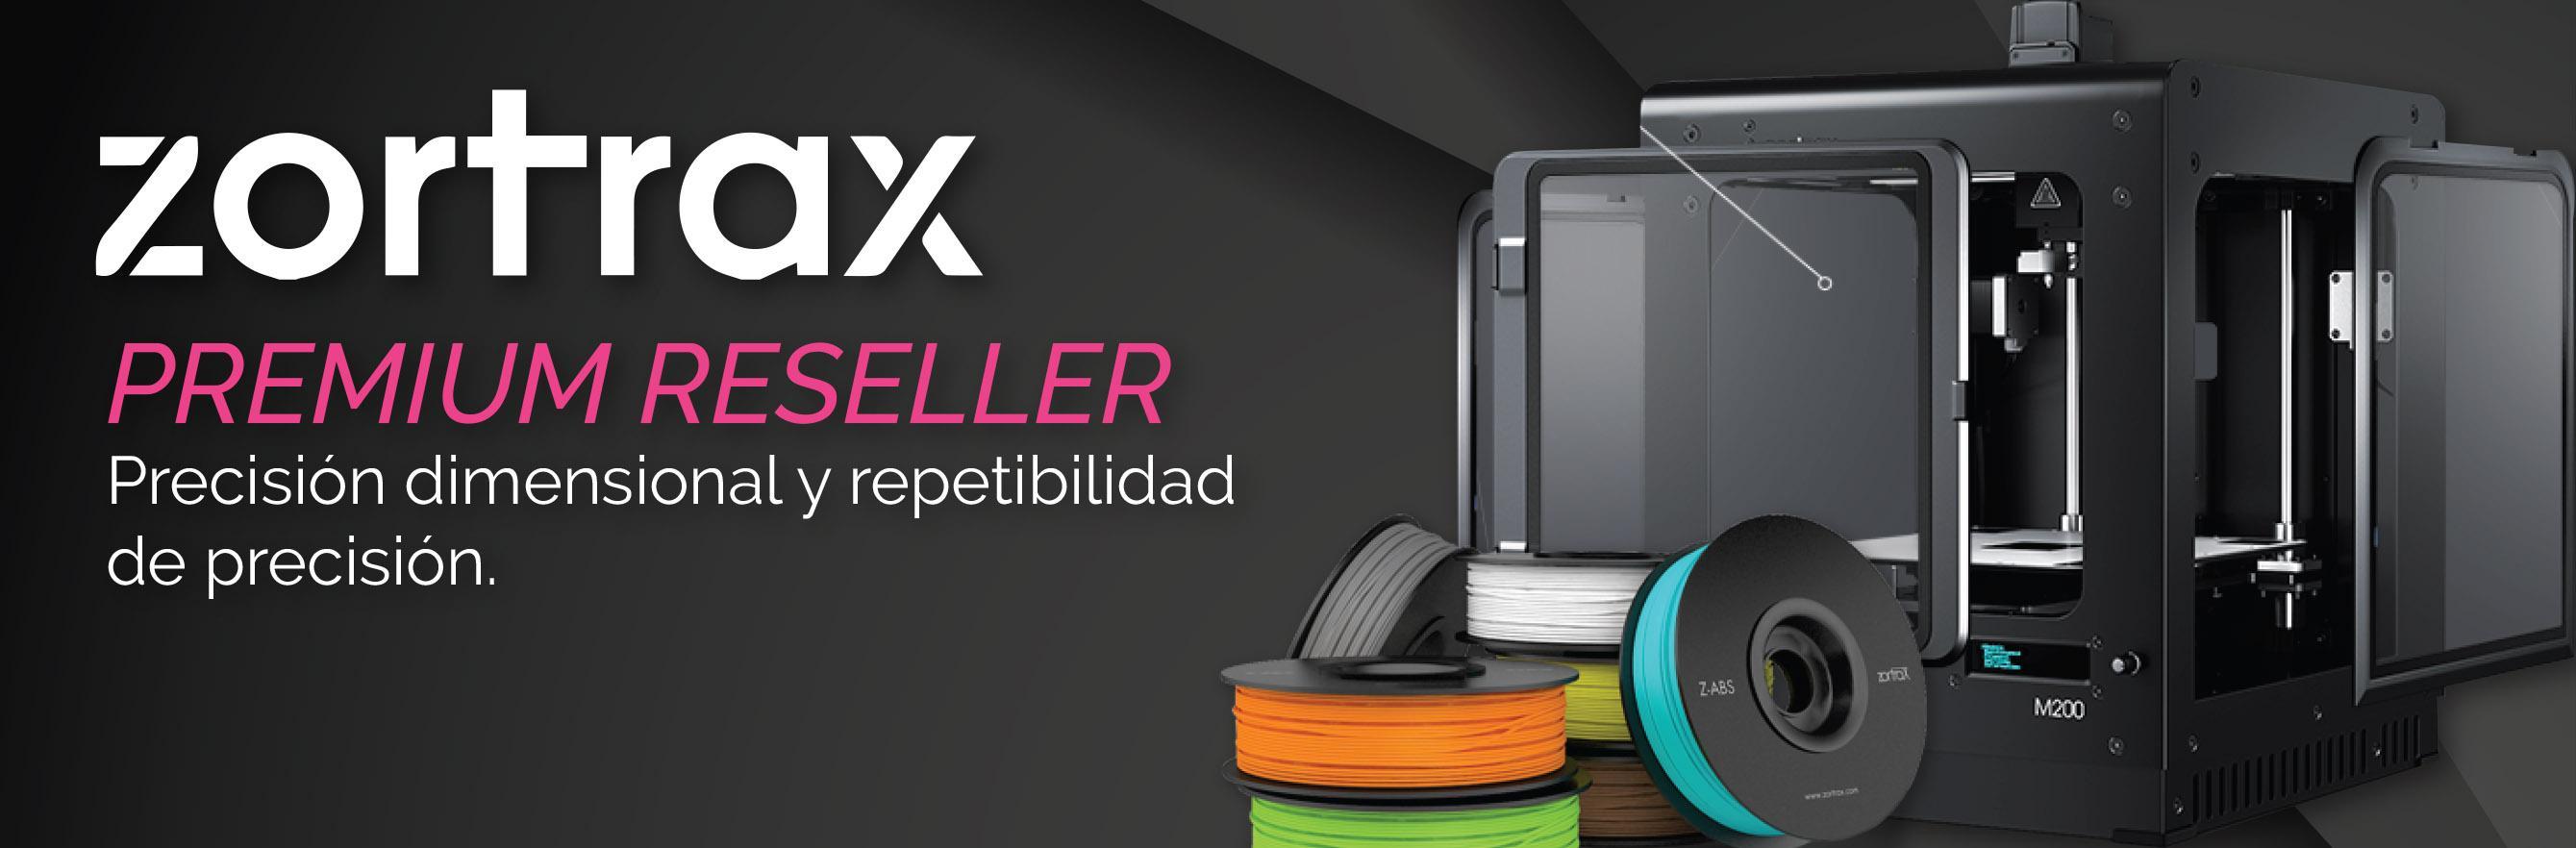 zortrax-slider-3dmarket-impresora3d-mexico